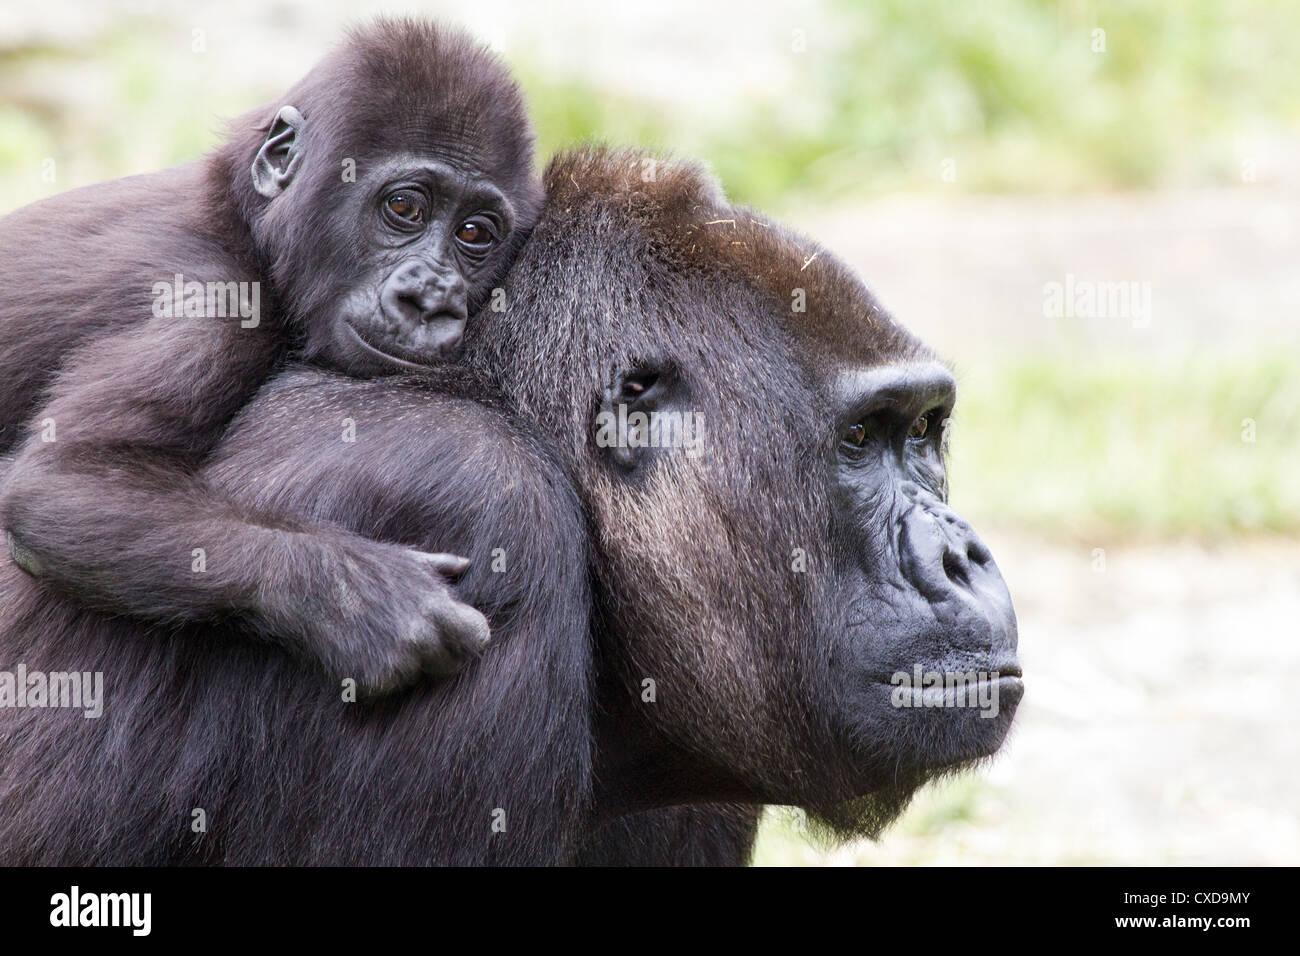 Close-up of mother western lowland gorilla (Gorilla gorilla) carnying baby on her back, Netherlands - Stock Image